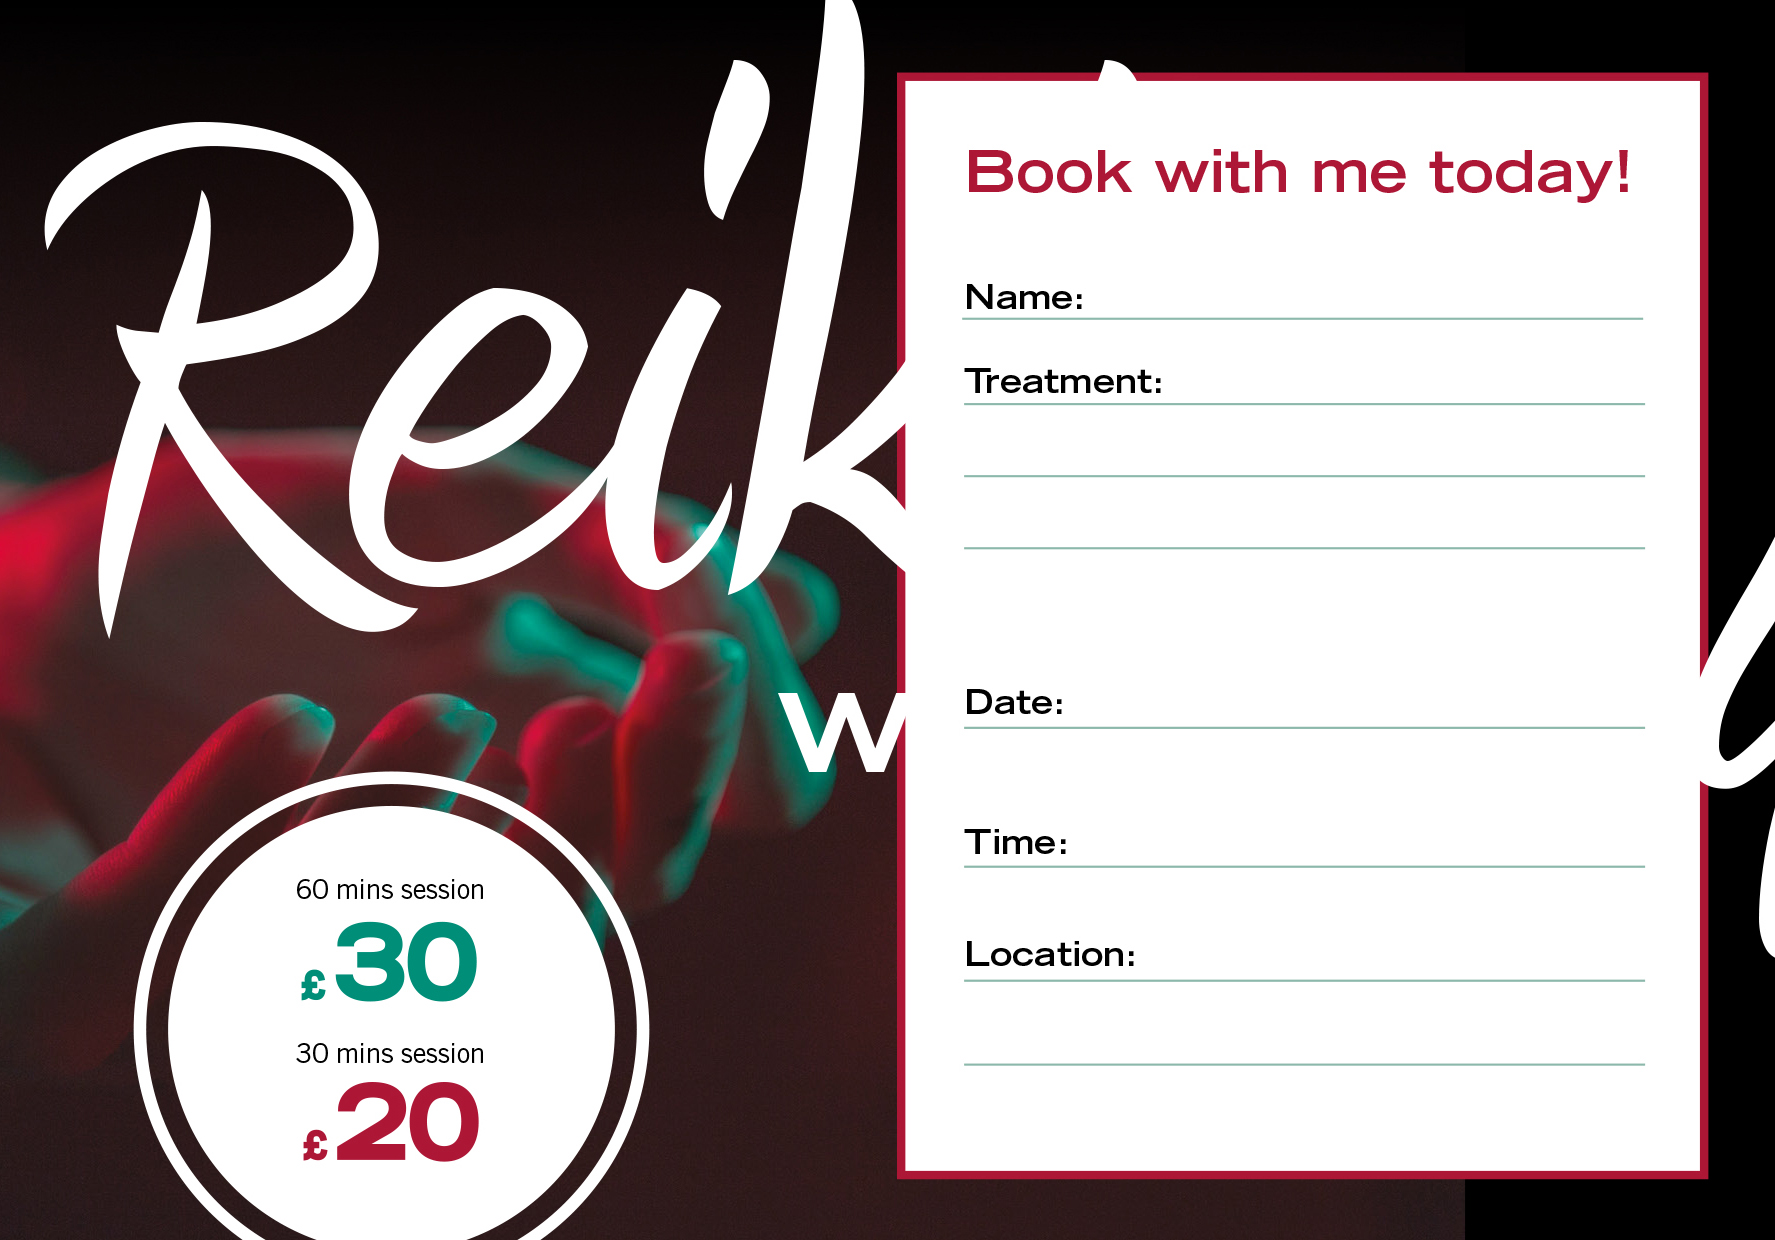 Reiki_Postcard-business-card_FINAL_spread-4.jpg